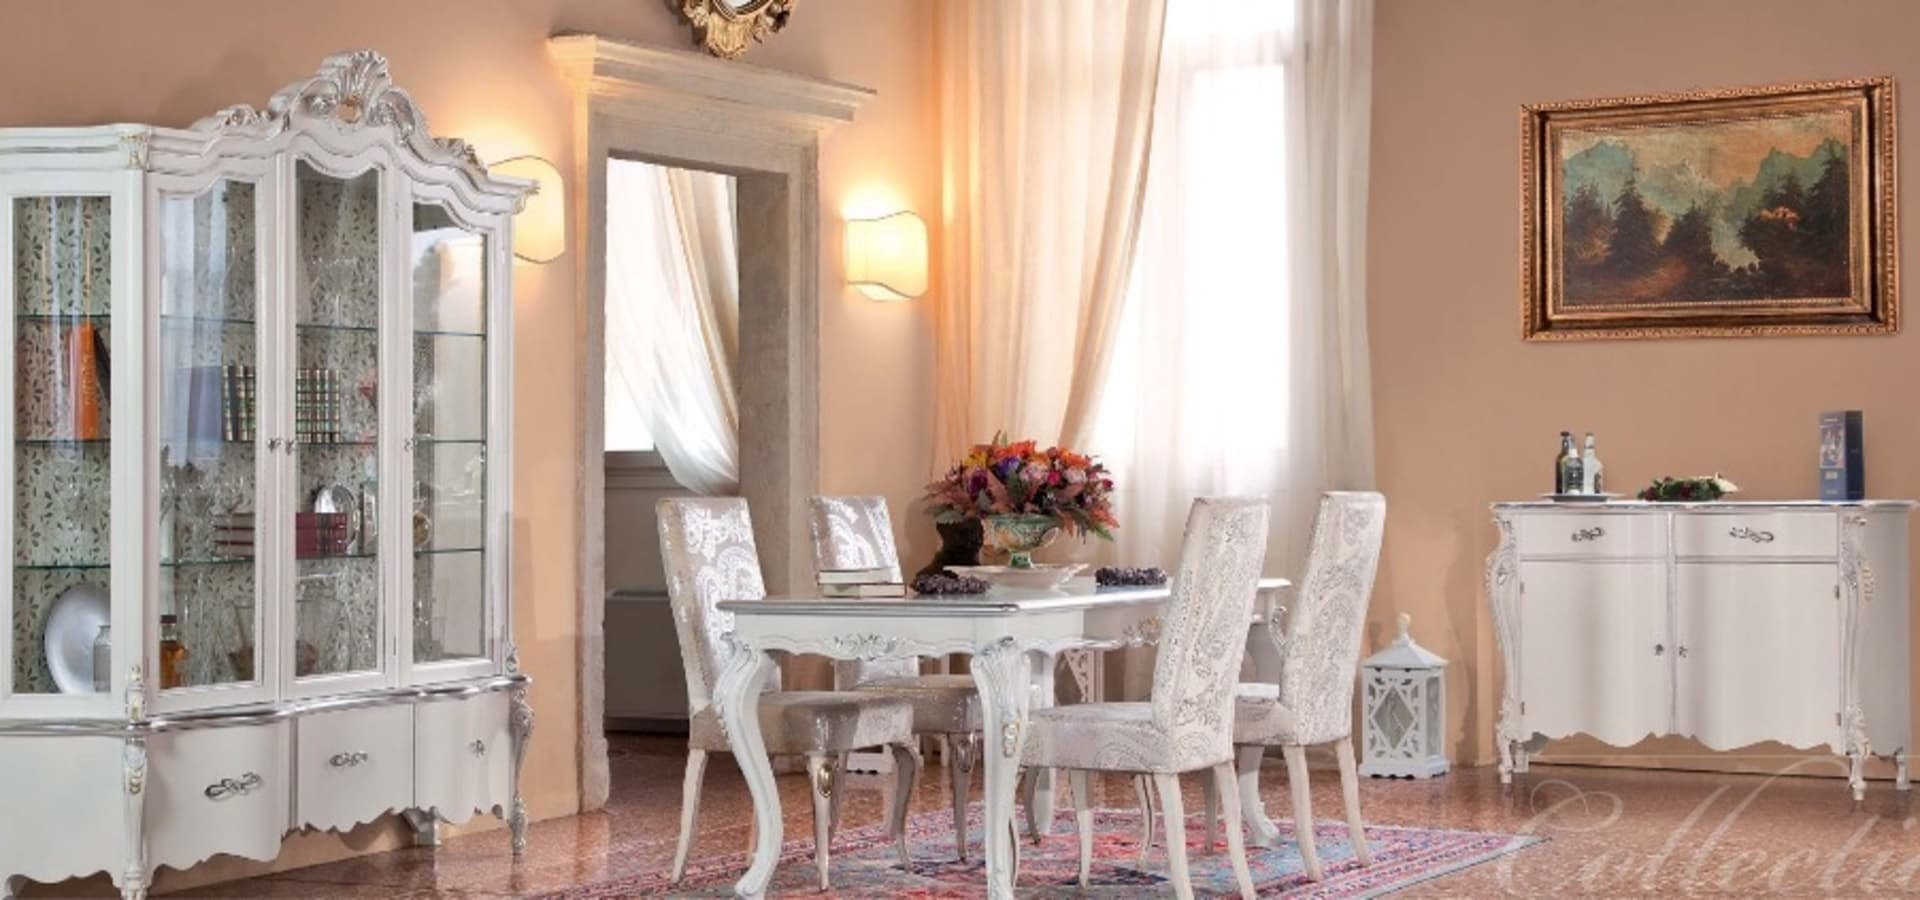 Stunning camere stile shabby contemporary - Camere da letto stile shabby ...